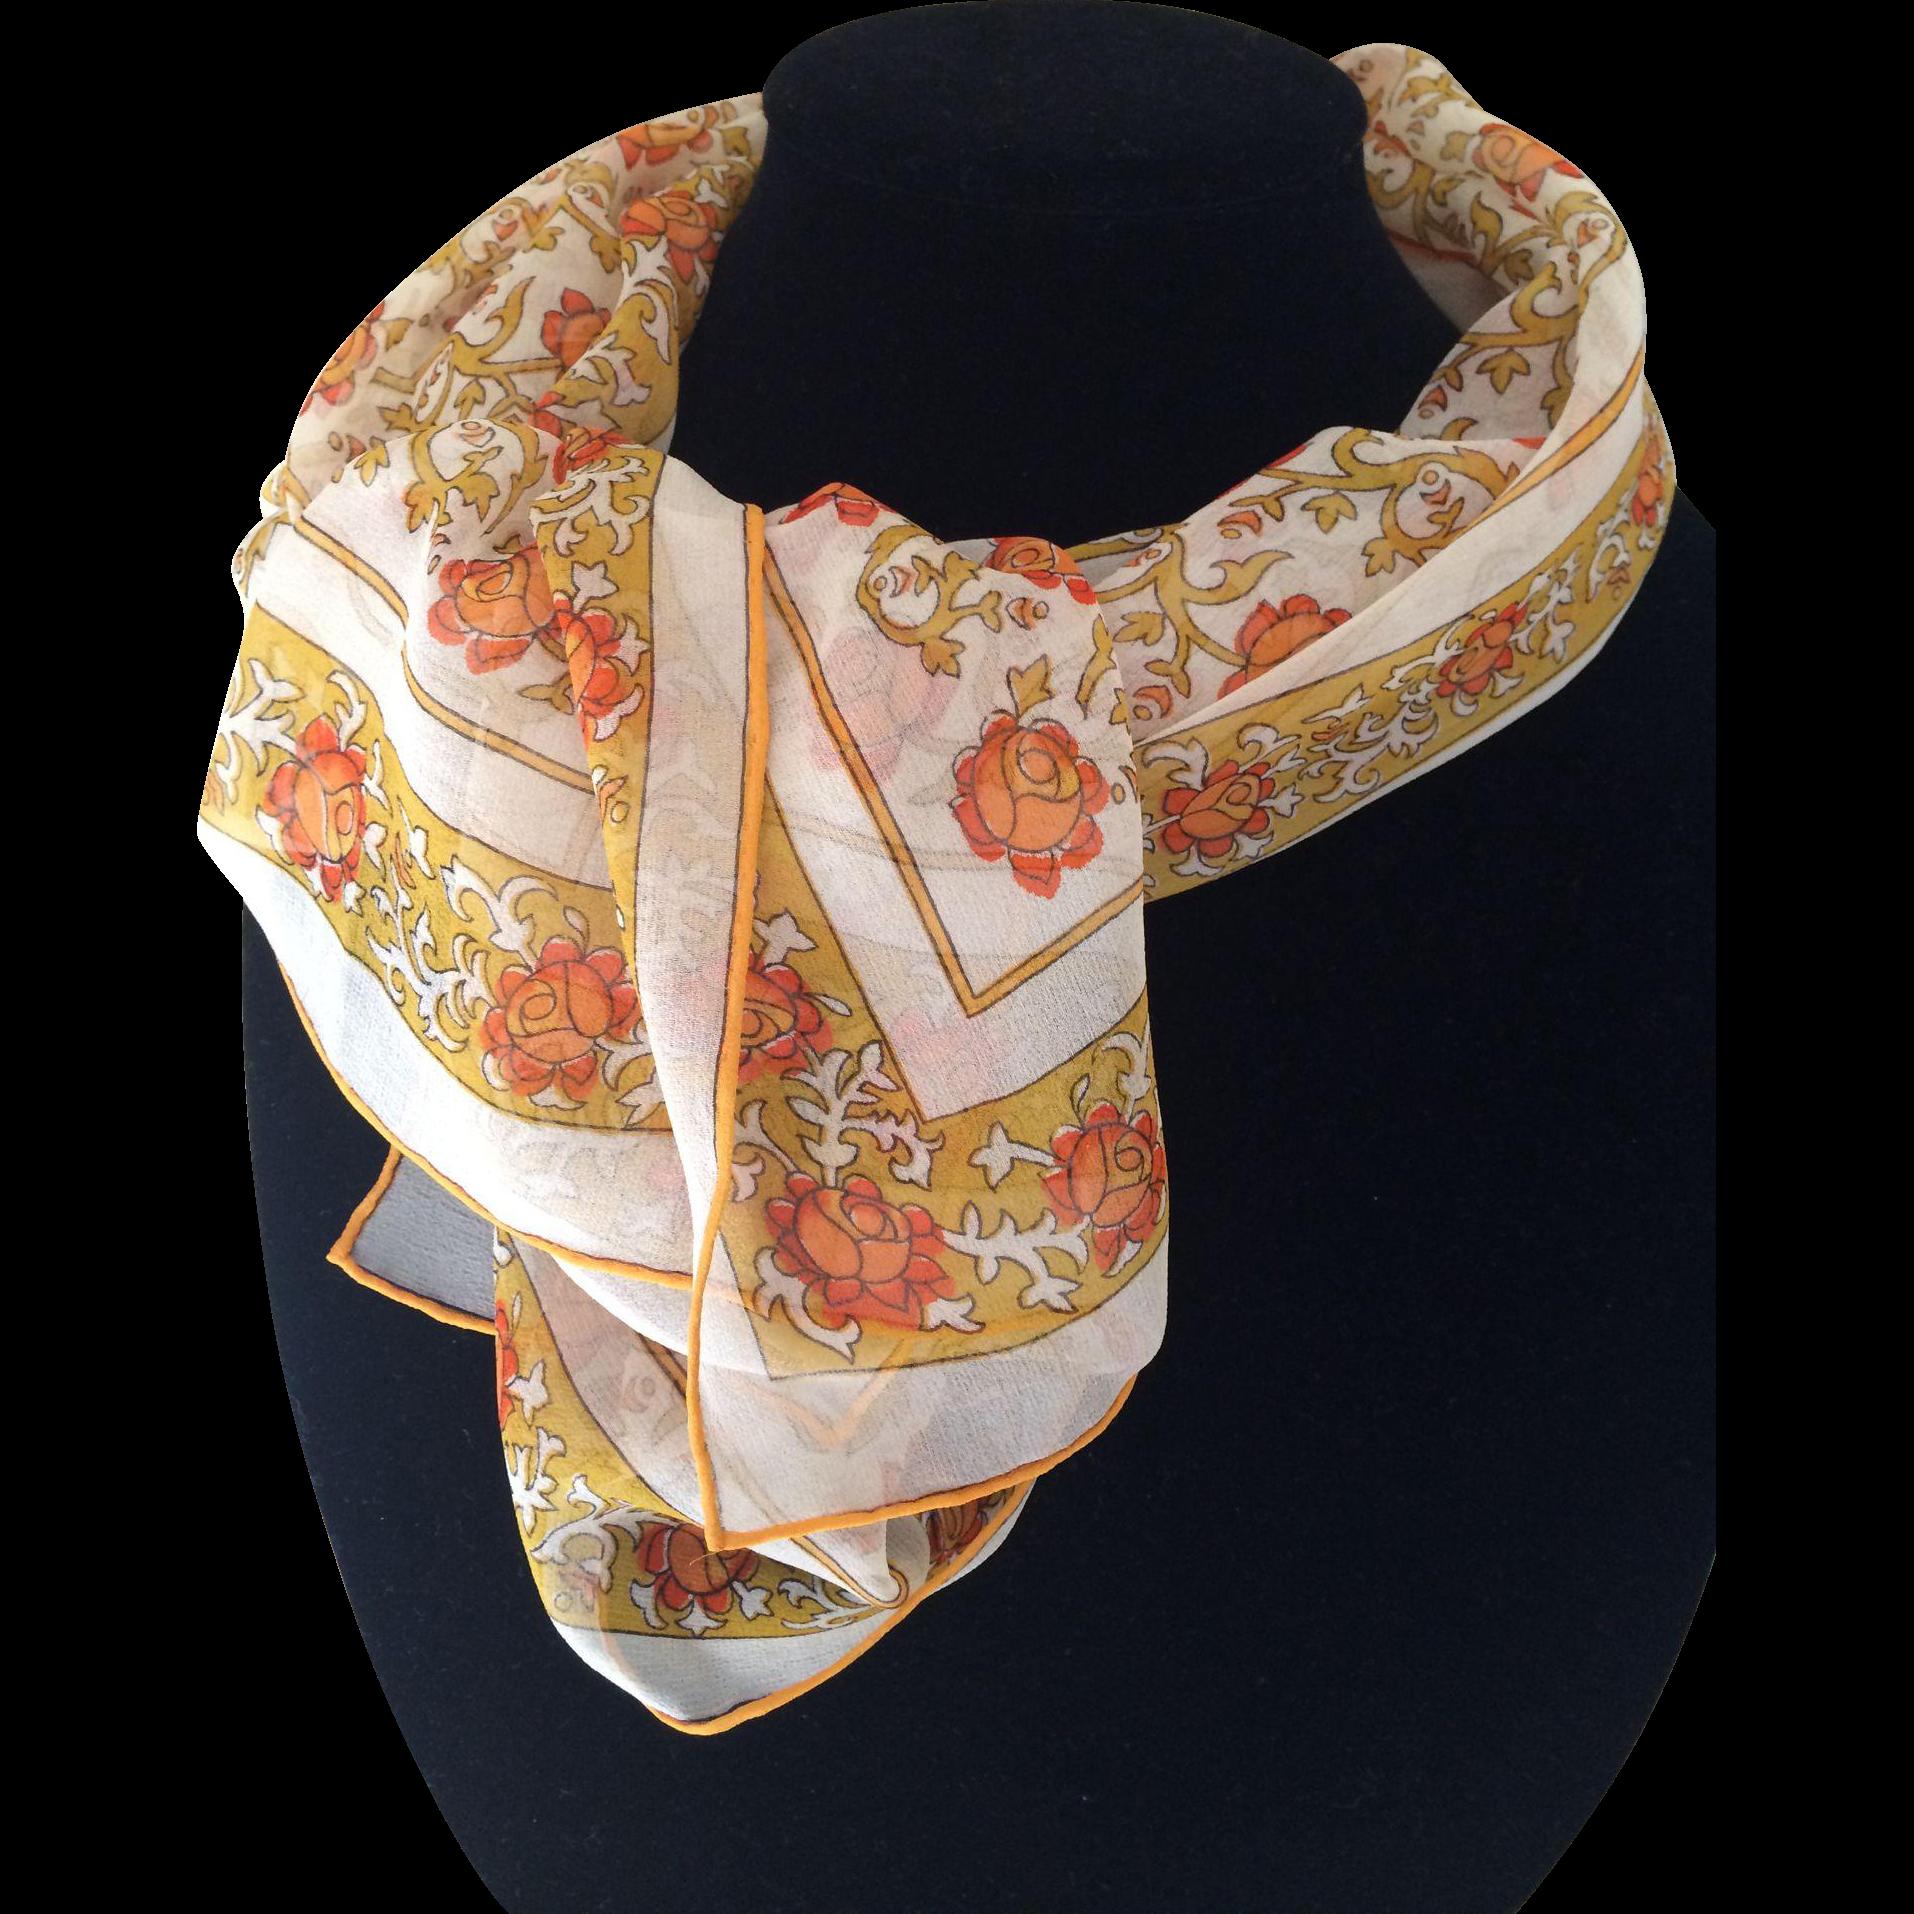 Vintage gossamer silk chiffon floral print rectangular scarf